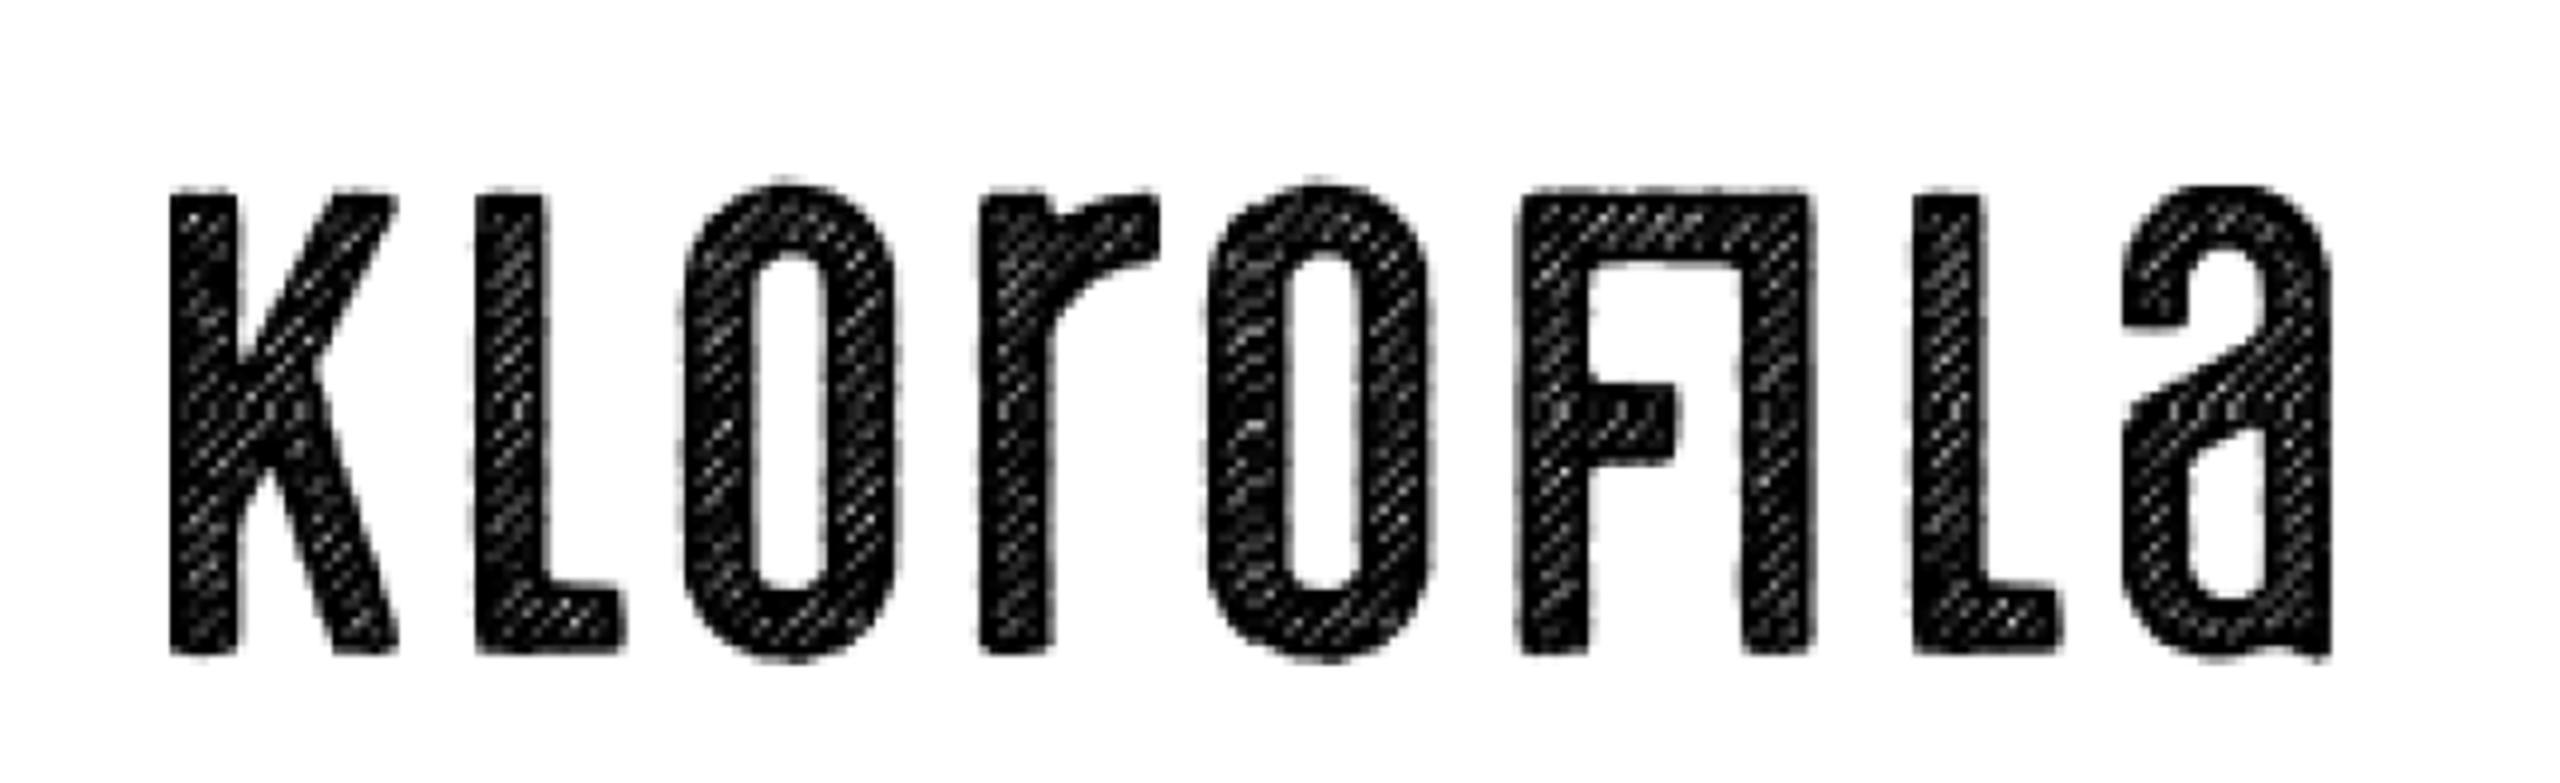 Klorofila Ecología Urbana